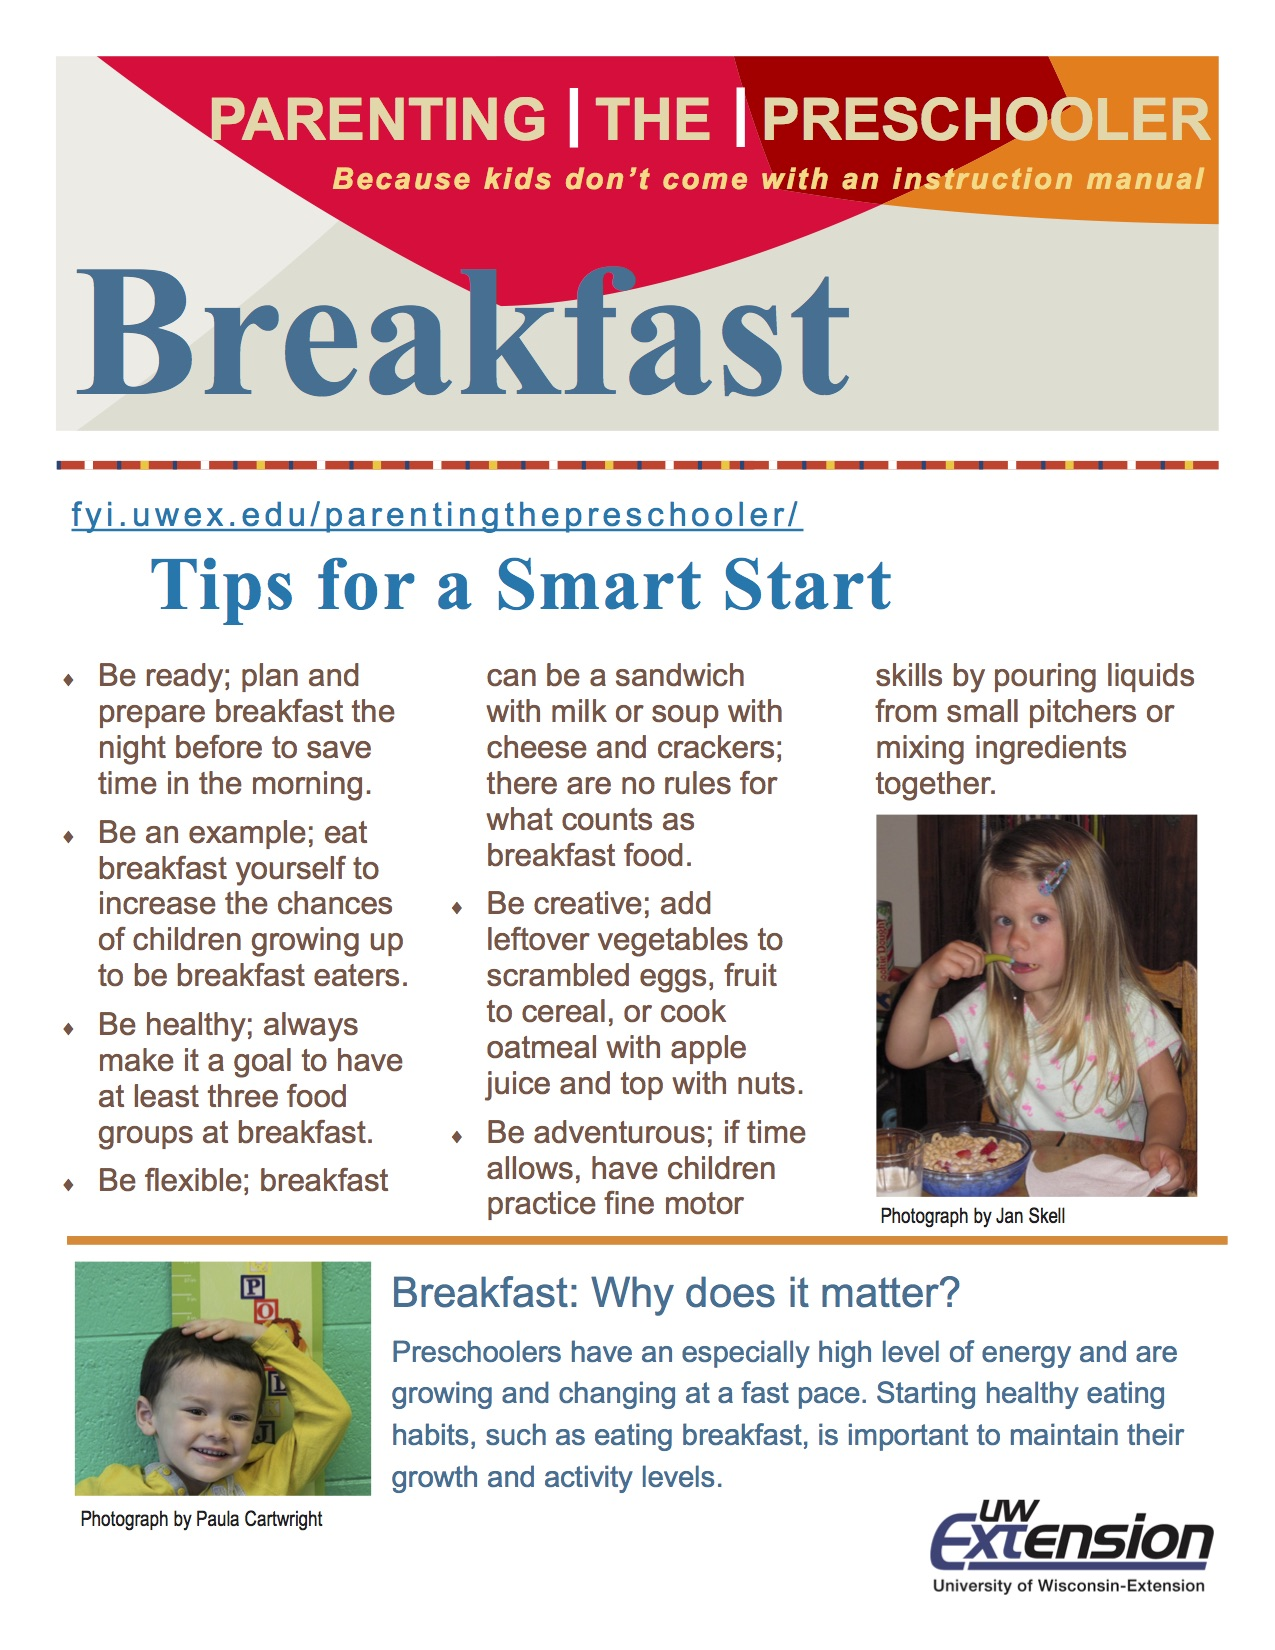 PtP-Breakfast-State